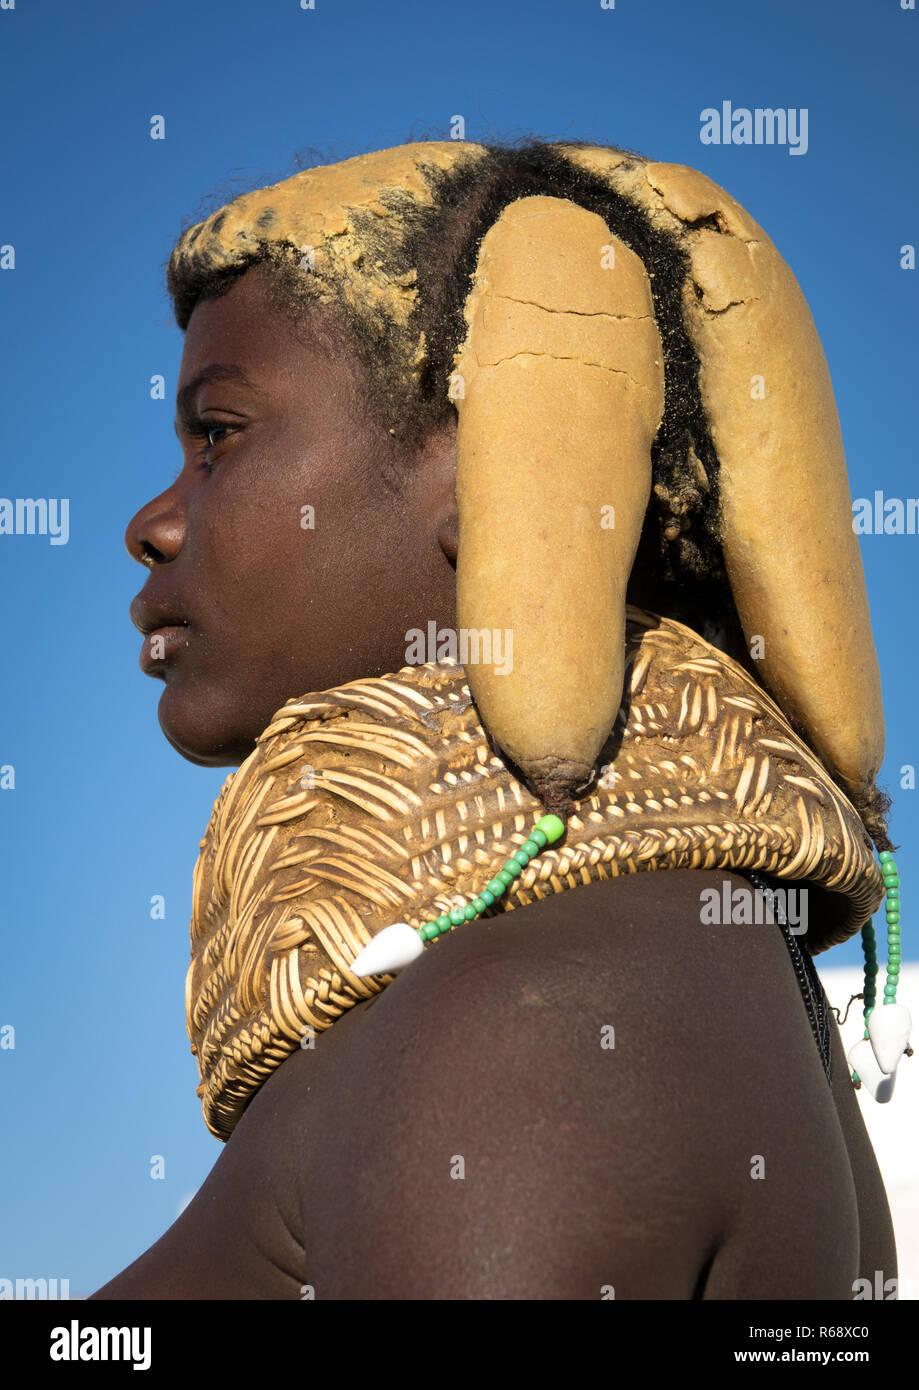 Mwila tribe young woman, Huila Province, Lubango, Angola - Stock Image